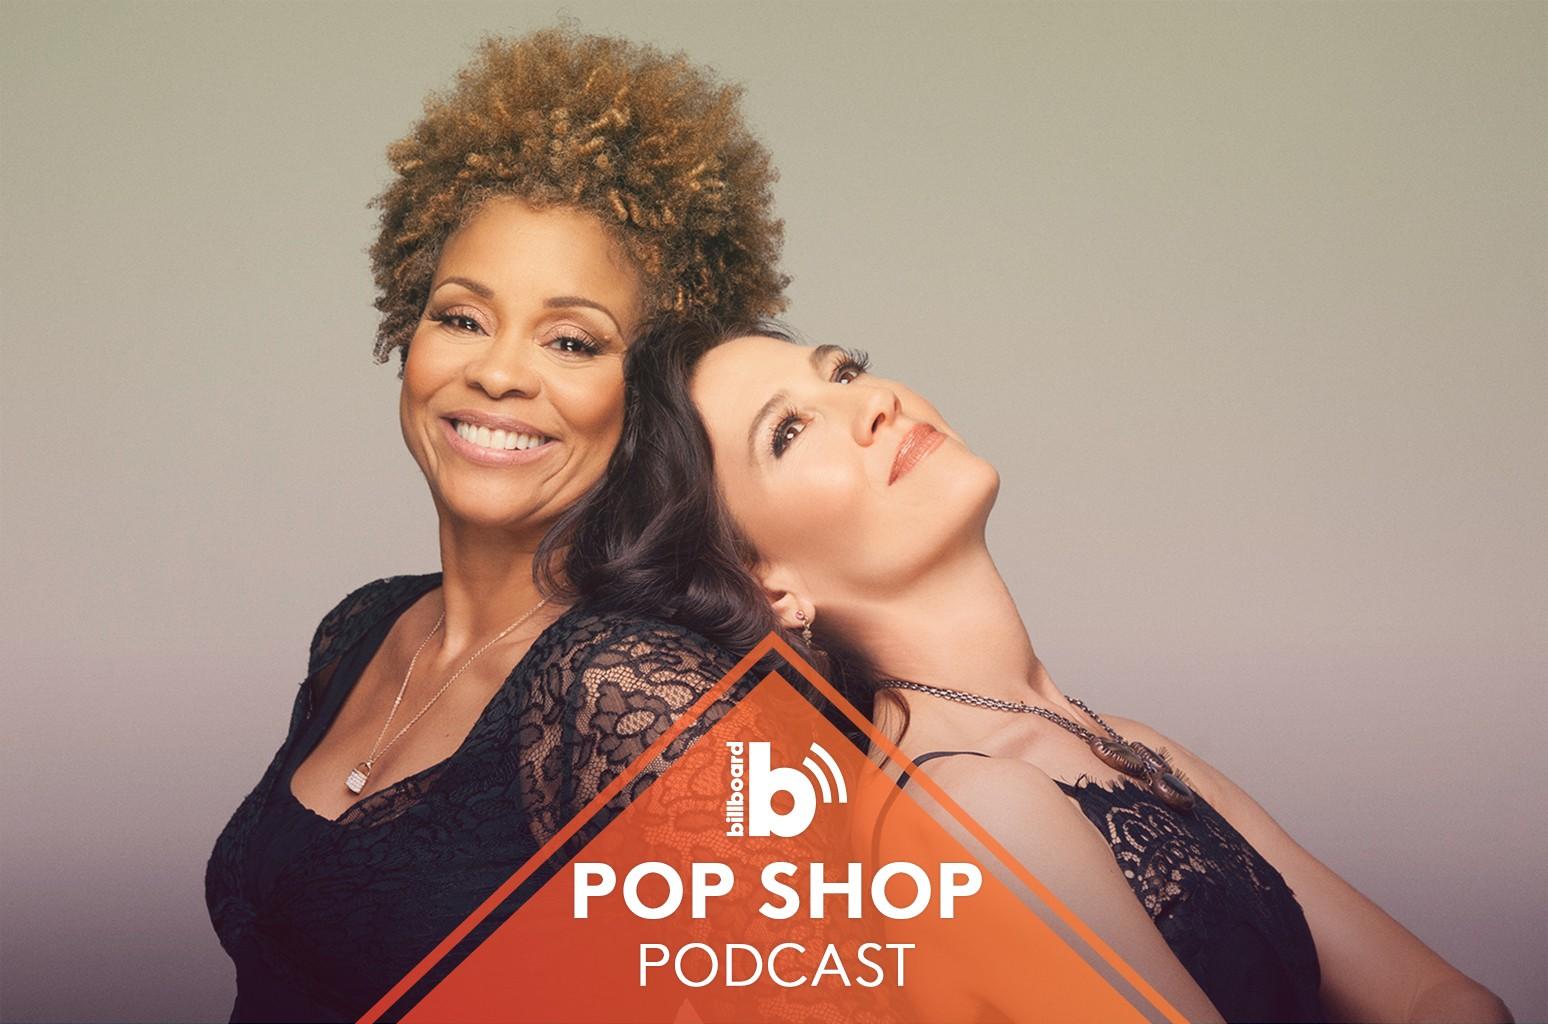 Pop Shop Podcast Niki Haris and Donna De Lory